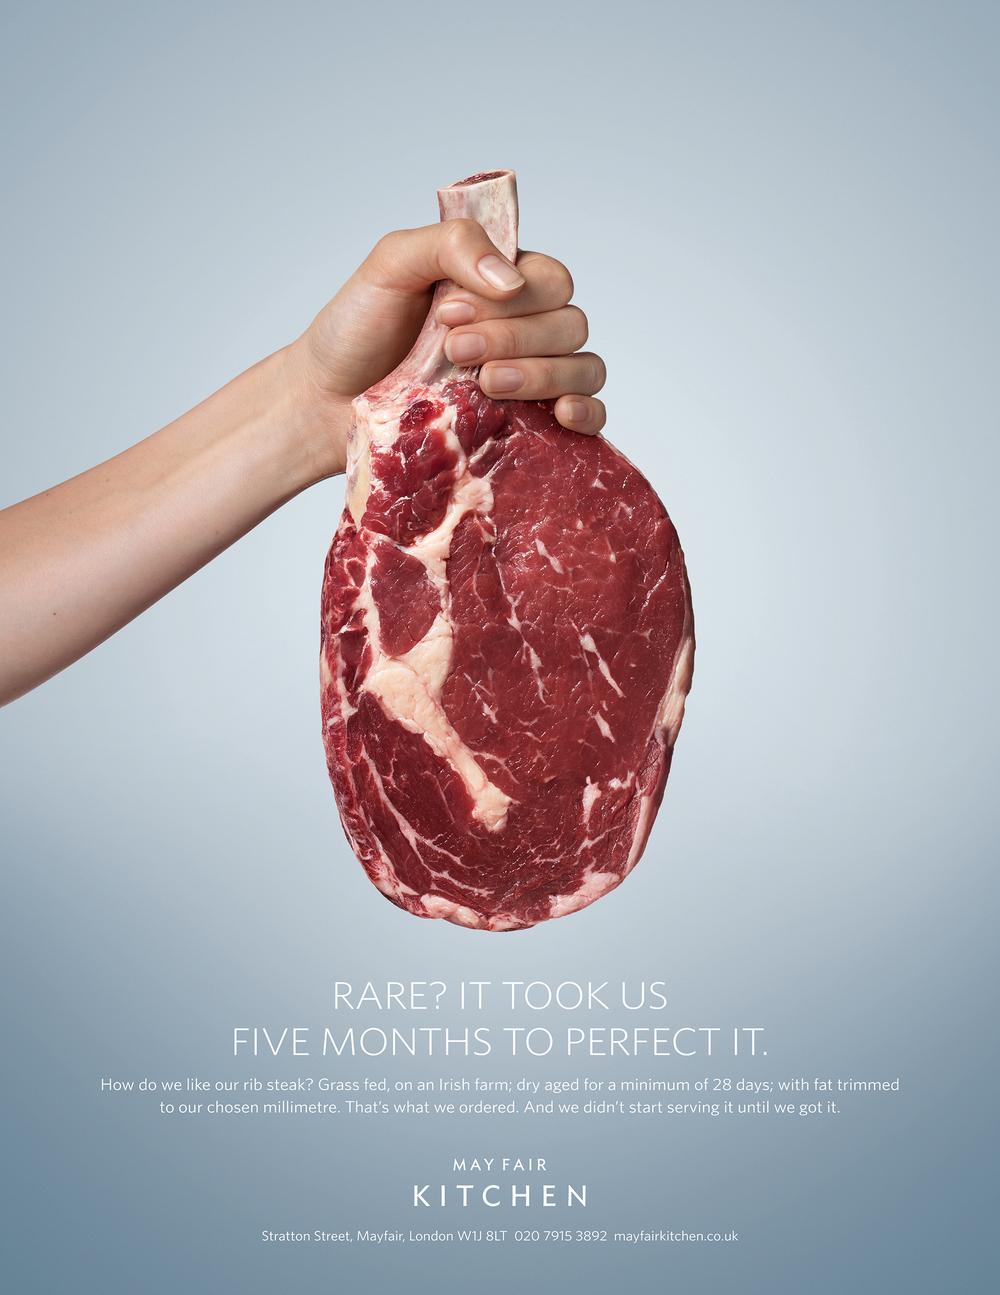 MayFairKitchen_Steak.jpg